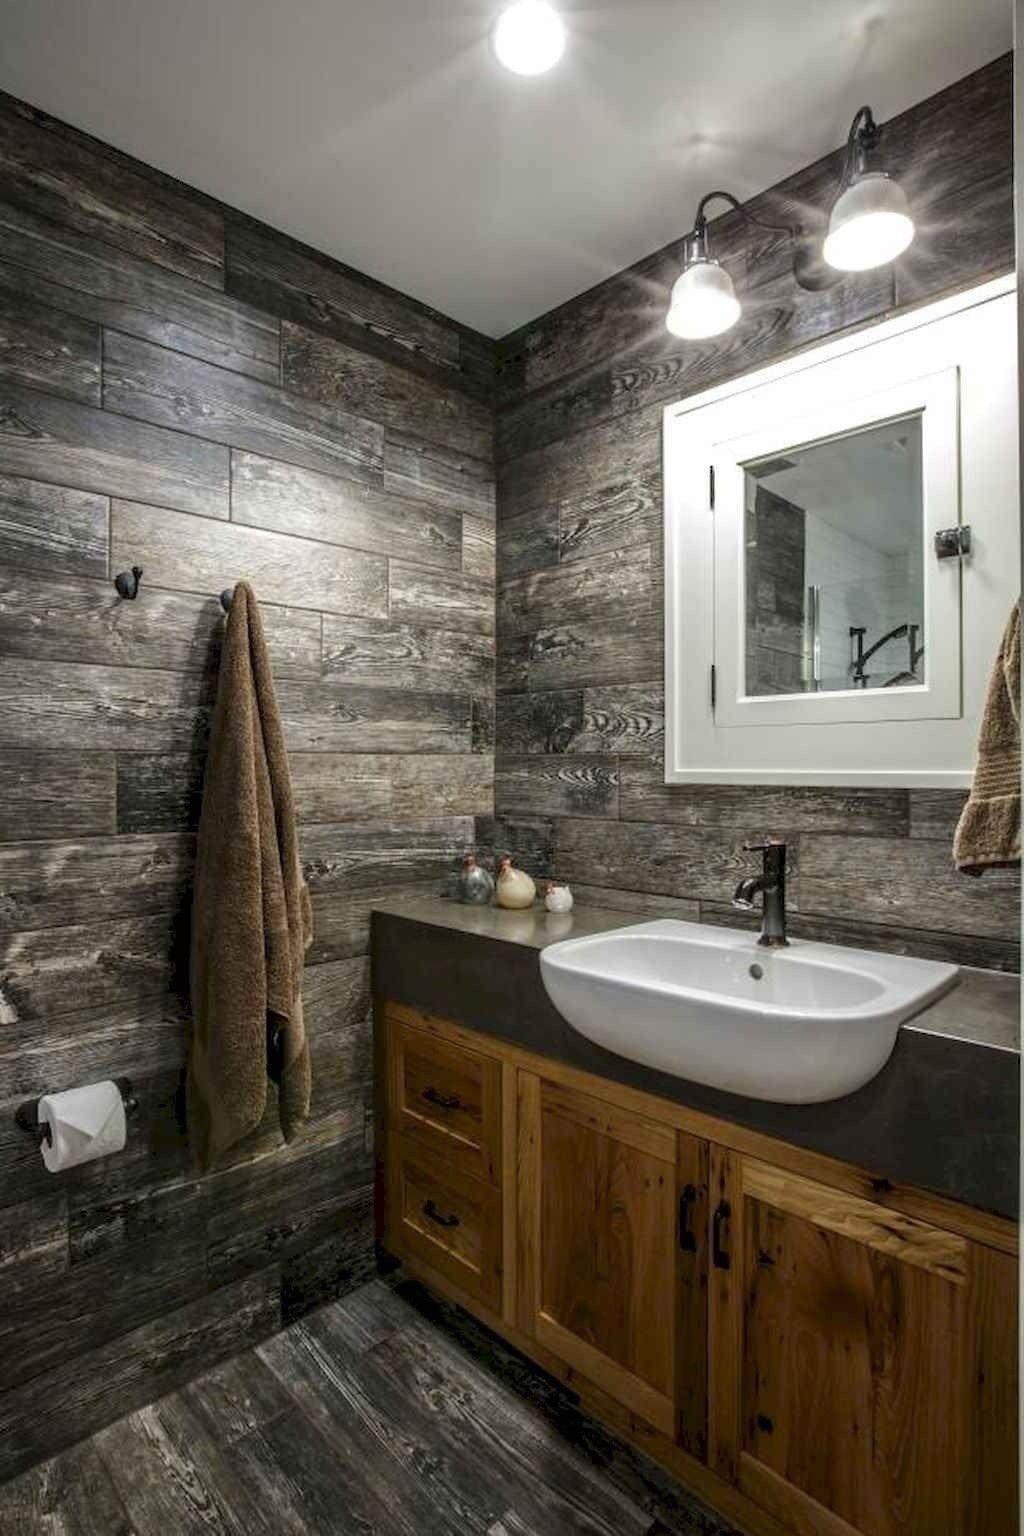 60 Rustic Master Bathroom Remodel Ideas Rustic Bathroom Designs Rustic Bathroom Rustic Master Bathroom Master bathroom wall decor